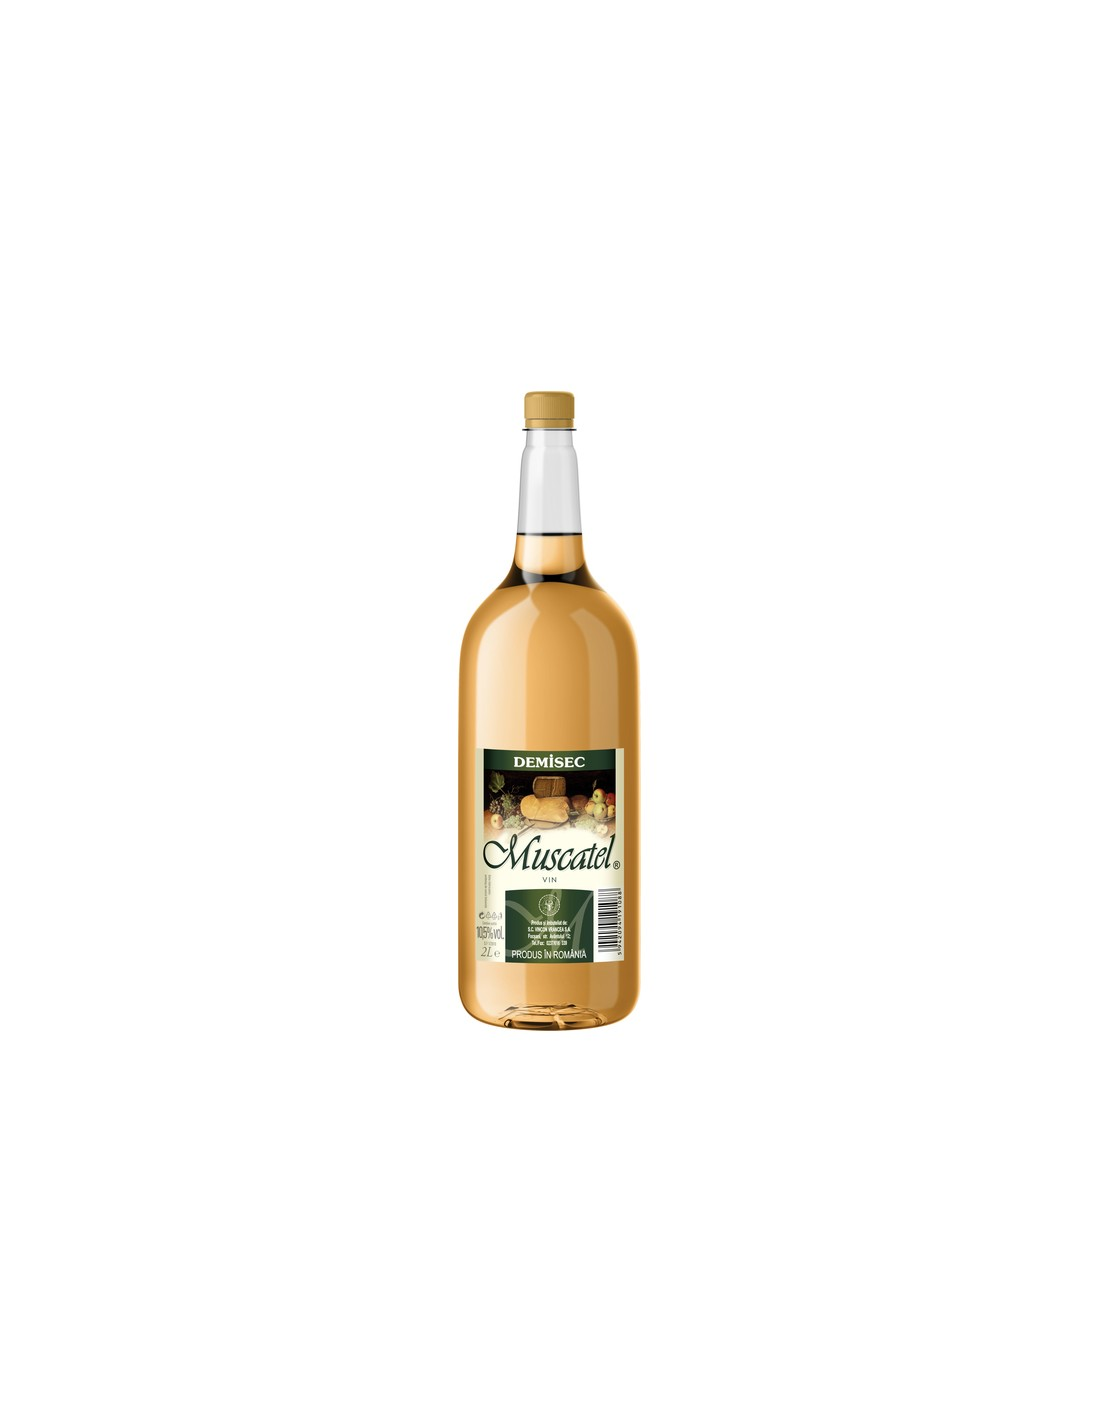 Vin alb demisec, Muscatel, 2L, 11% alc., Romania image0